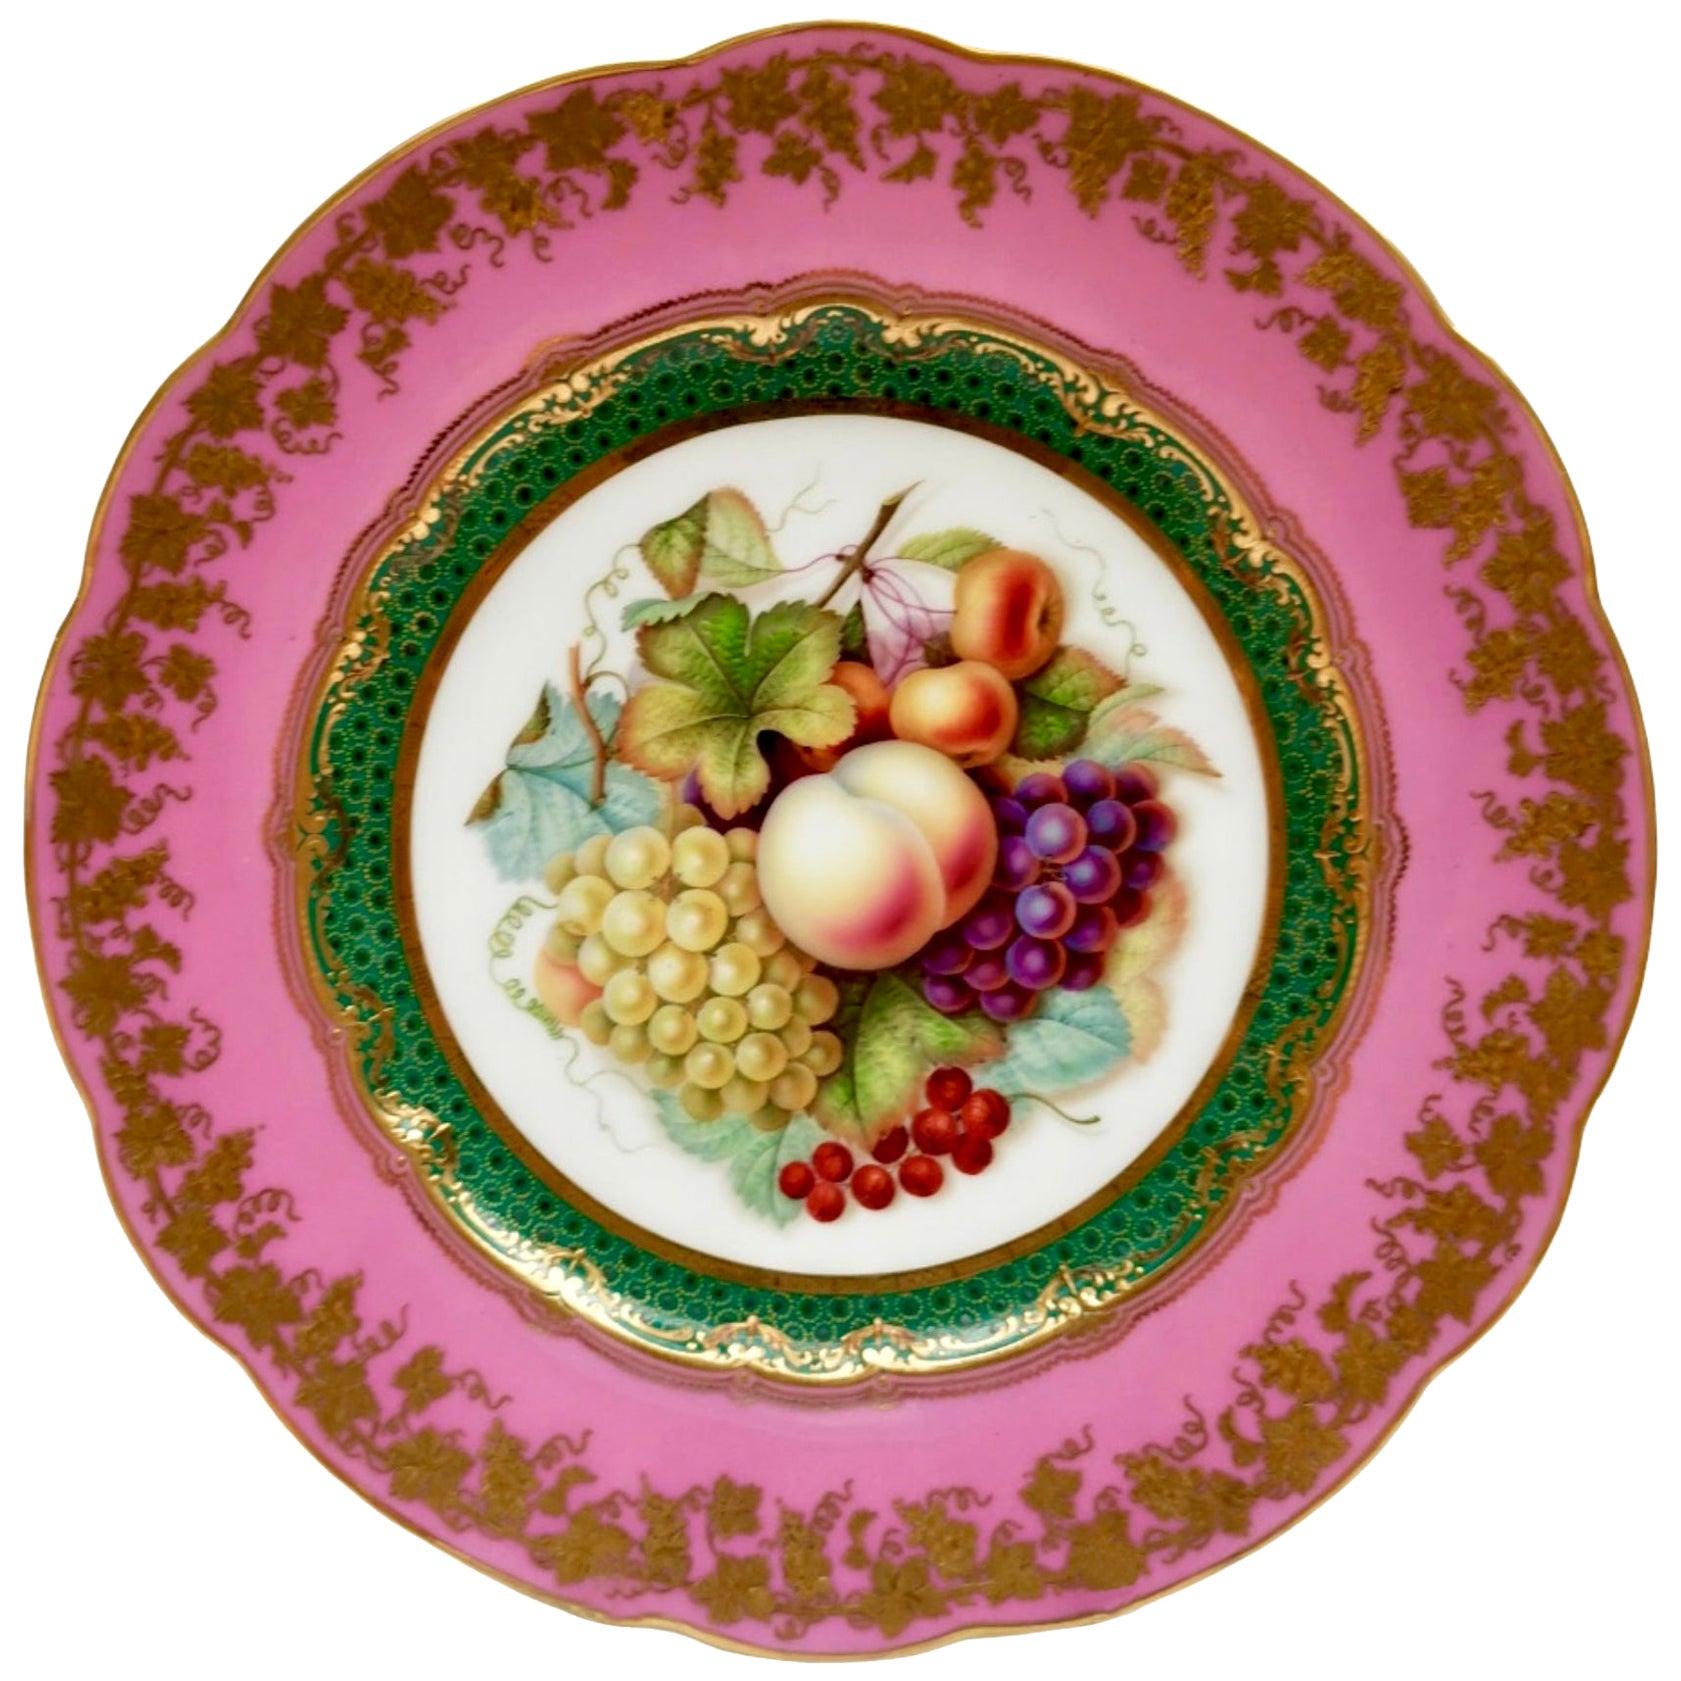 Coalport Porcelain Plate, Rose Du Barry Pink, Fruits by Jabey Aston, circa 1870